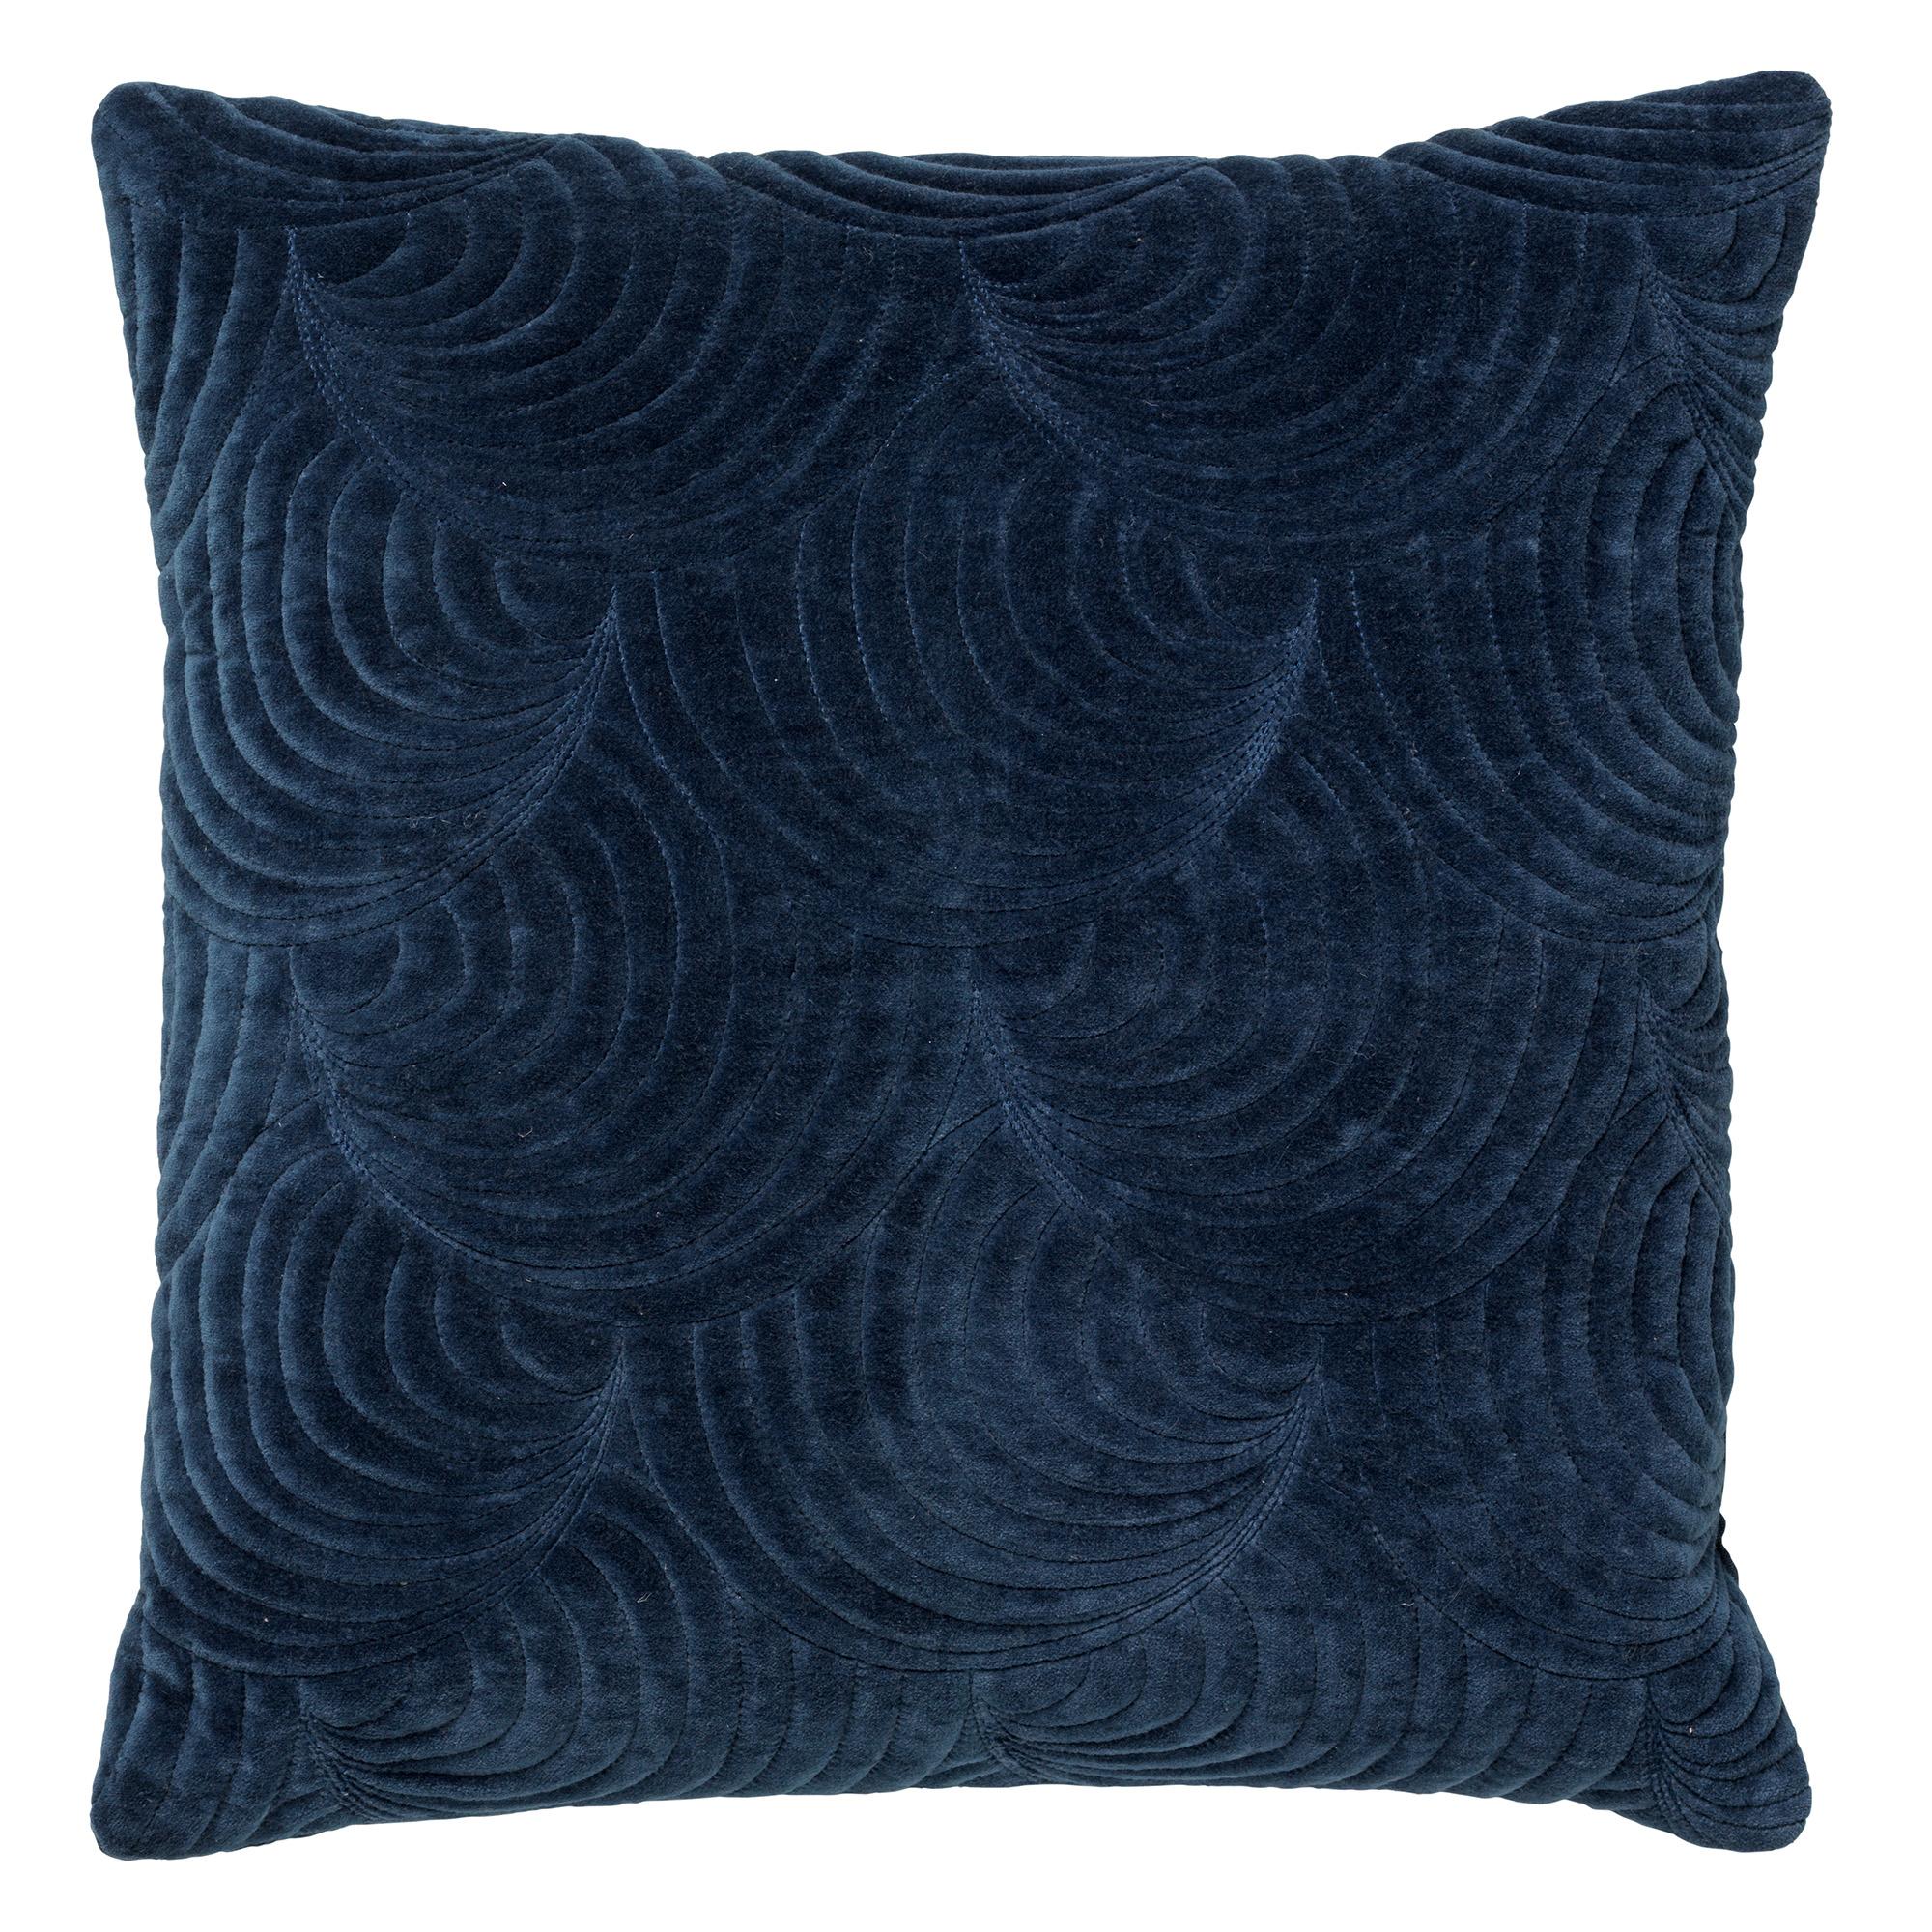 Coussin en velours Bleu saphir 45x45